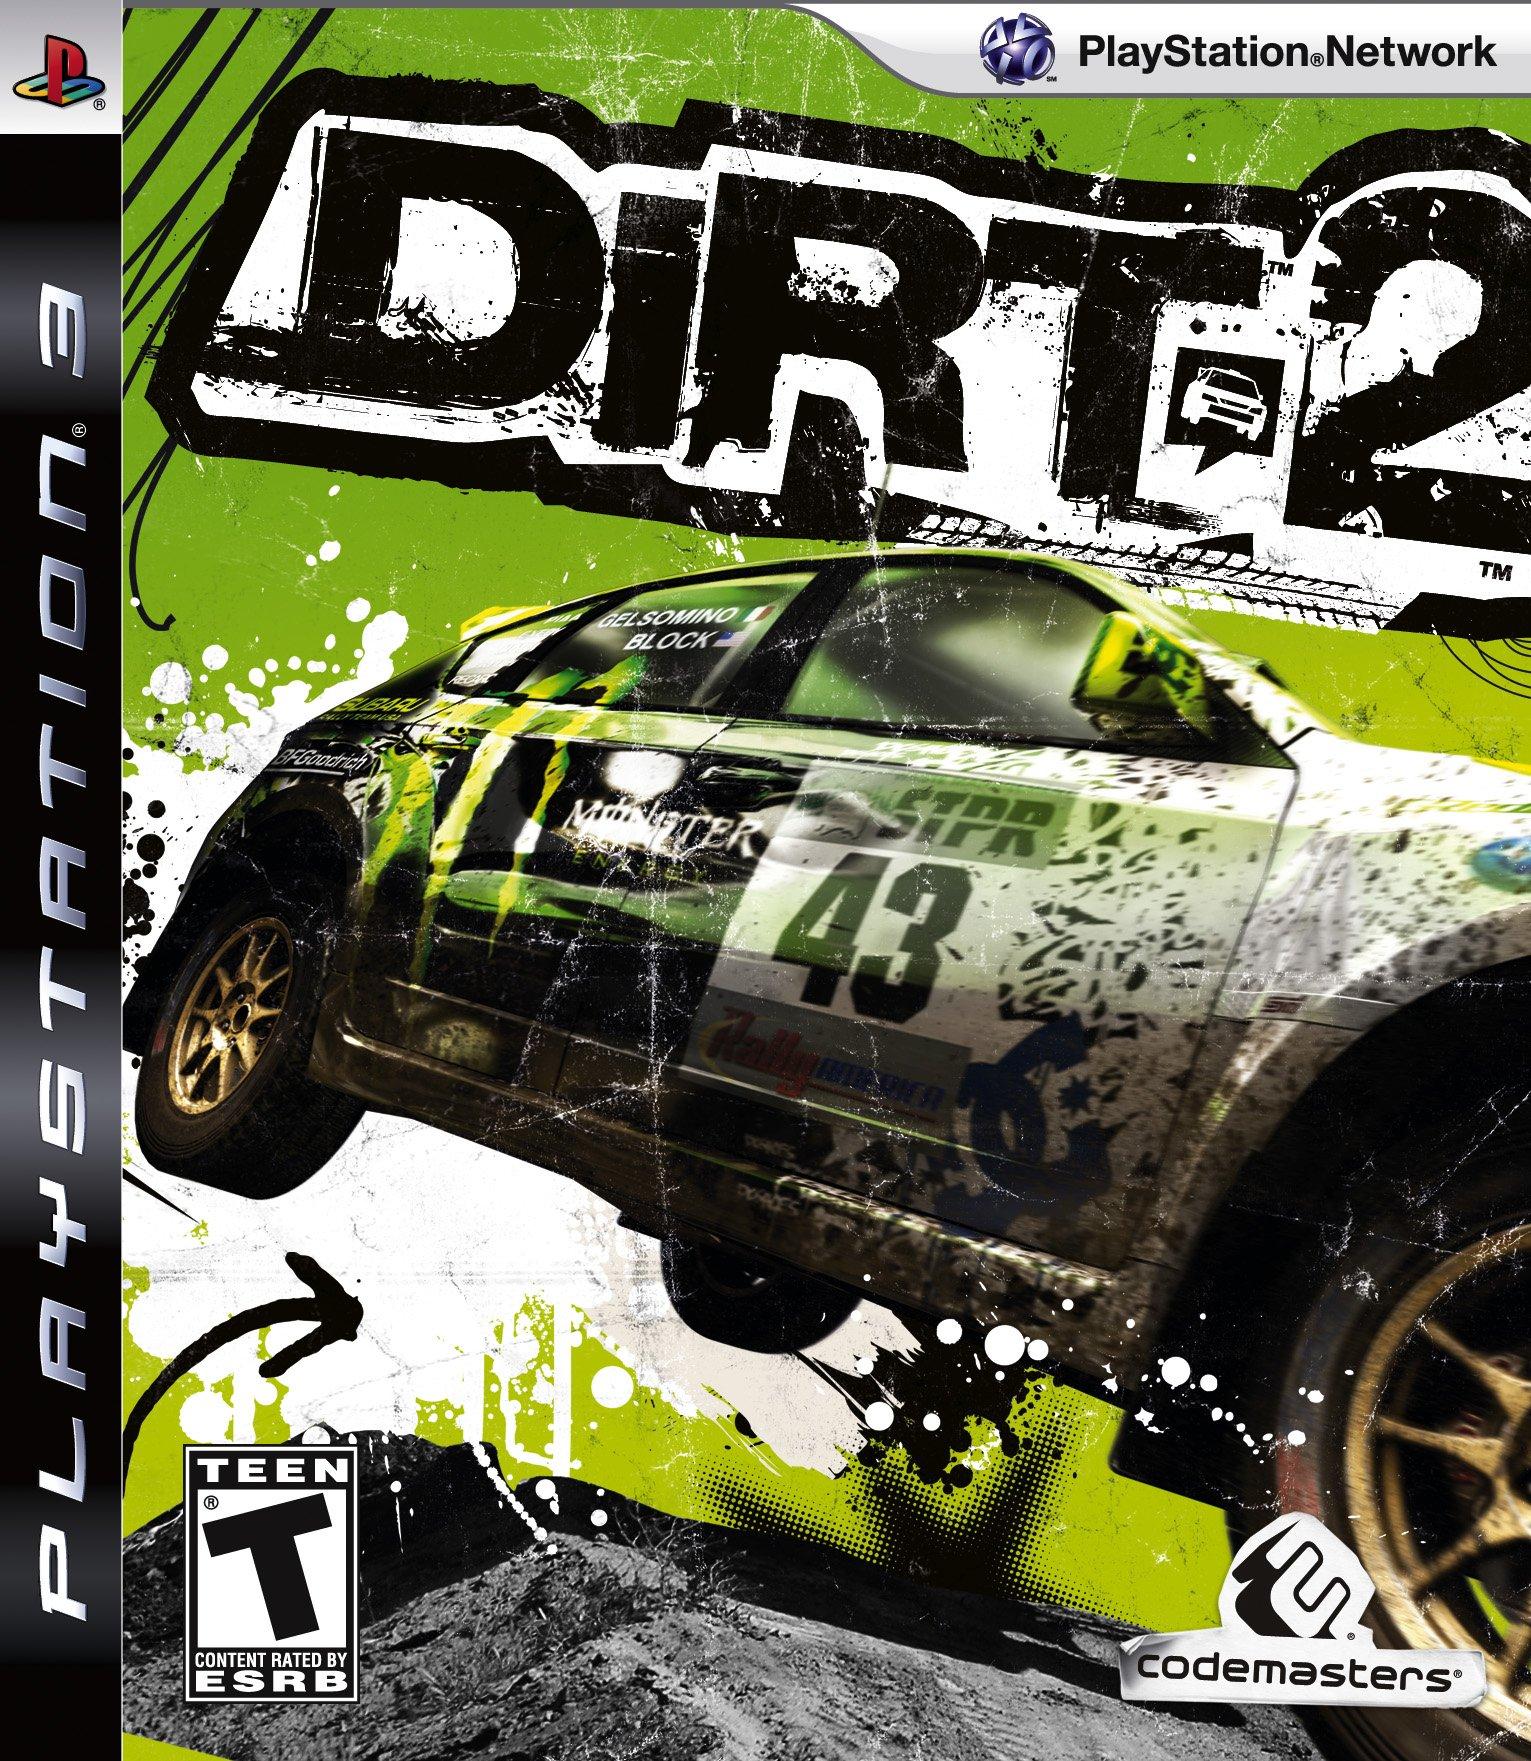 Dirt 2 - Playstation 3